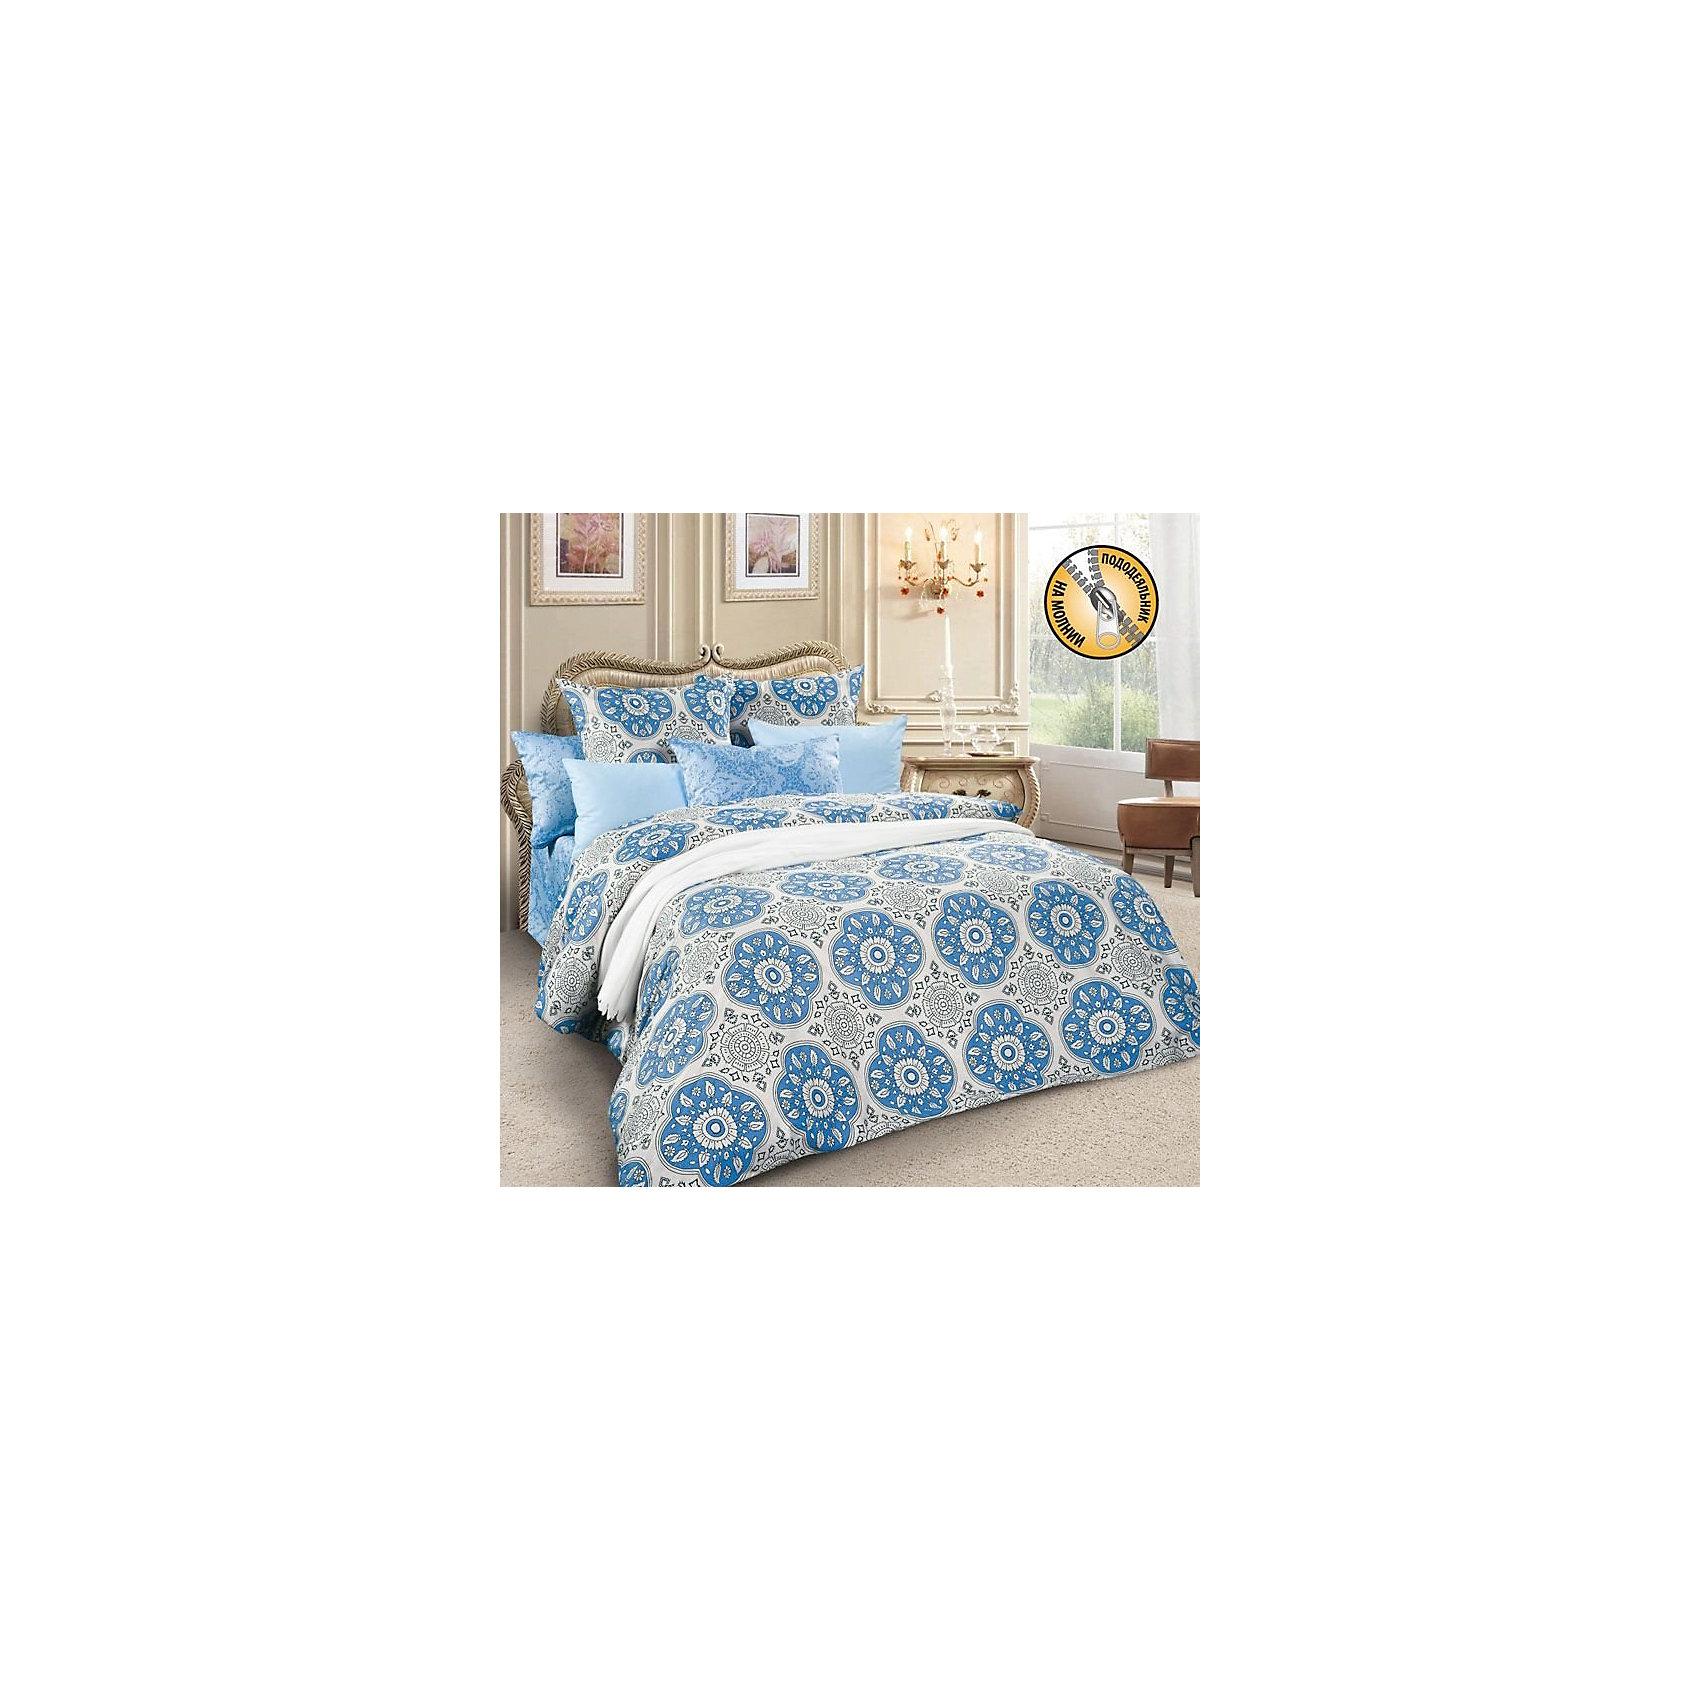 Letto Постельное белье 2,0 сп.  SM61 сатин, (нав.70х70), Letto комплект белья letto семейный наволочки 70х70 цвет голубой синий b183 7